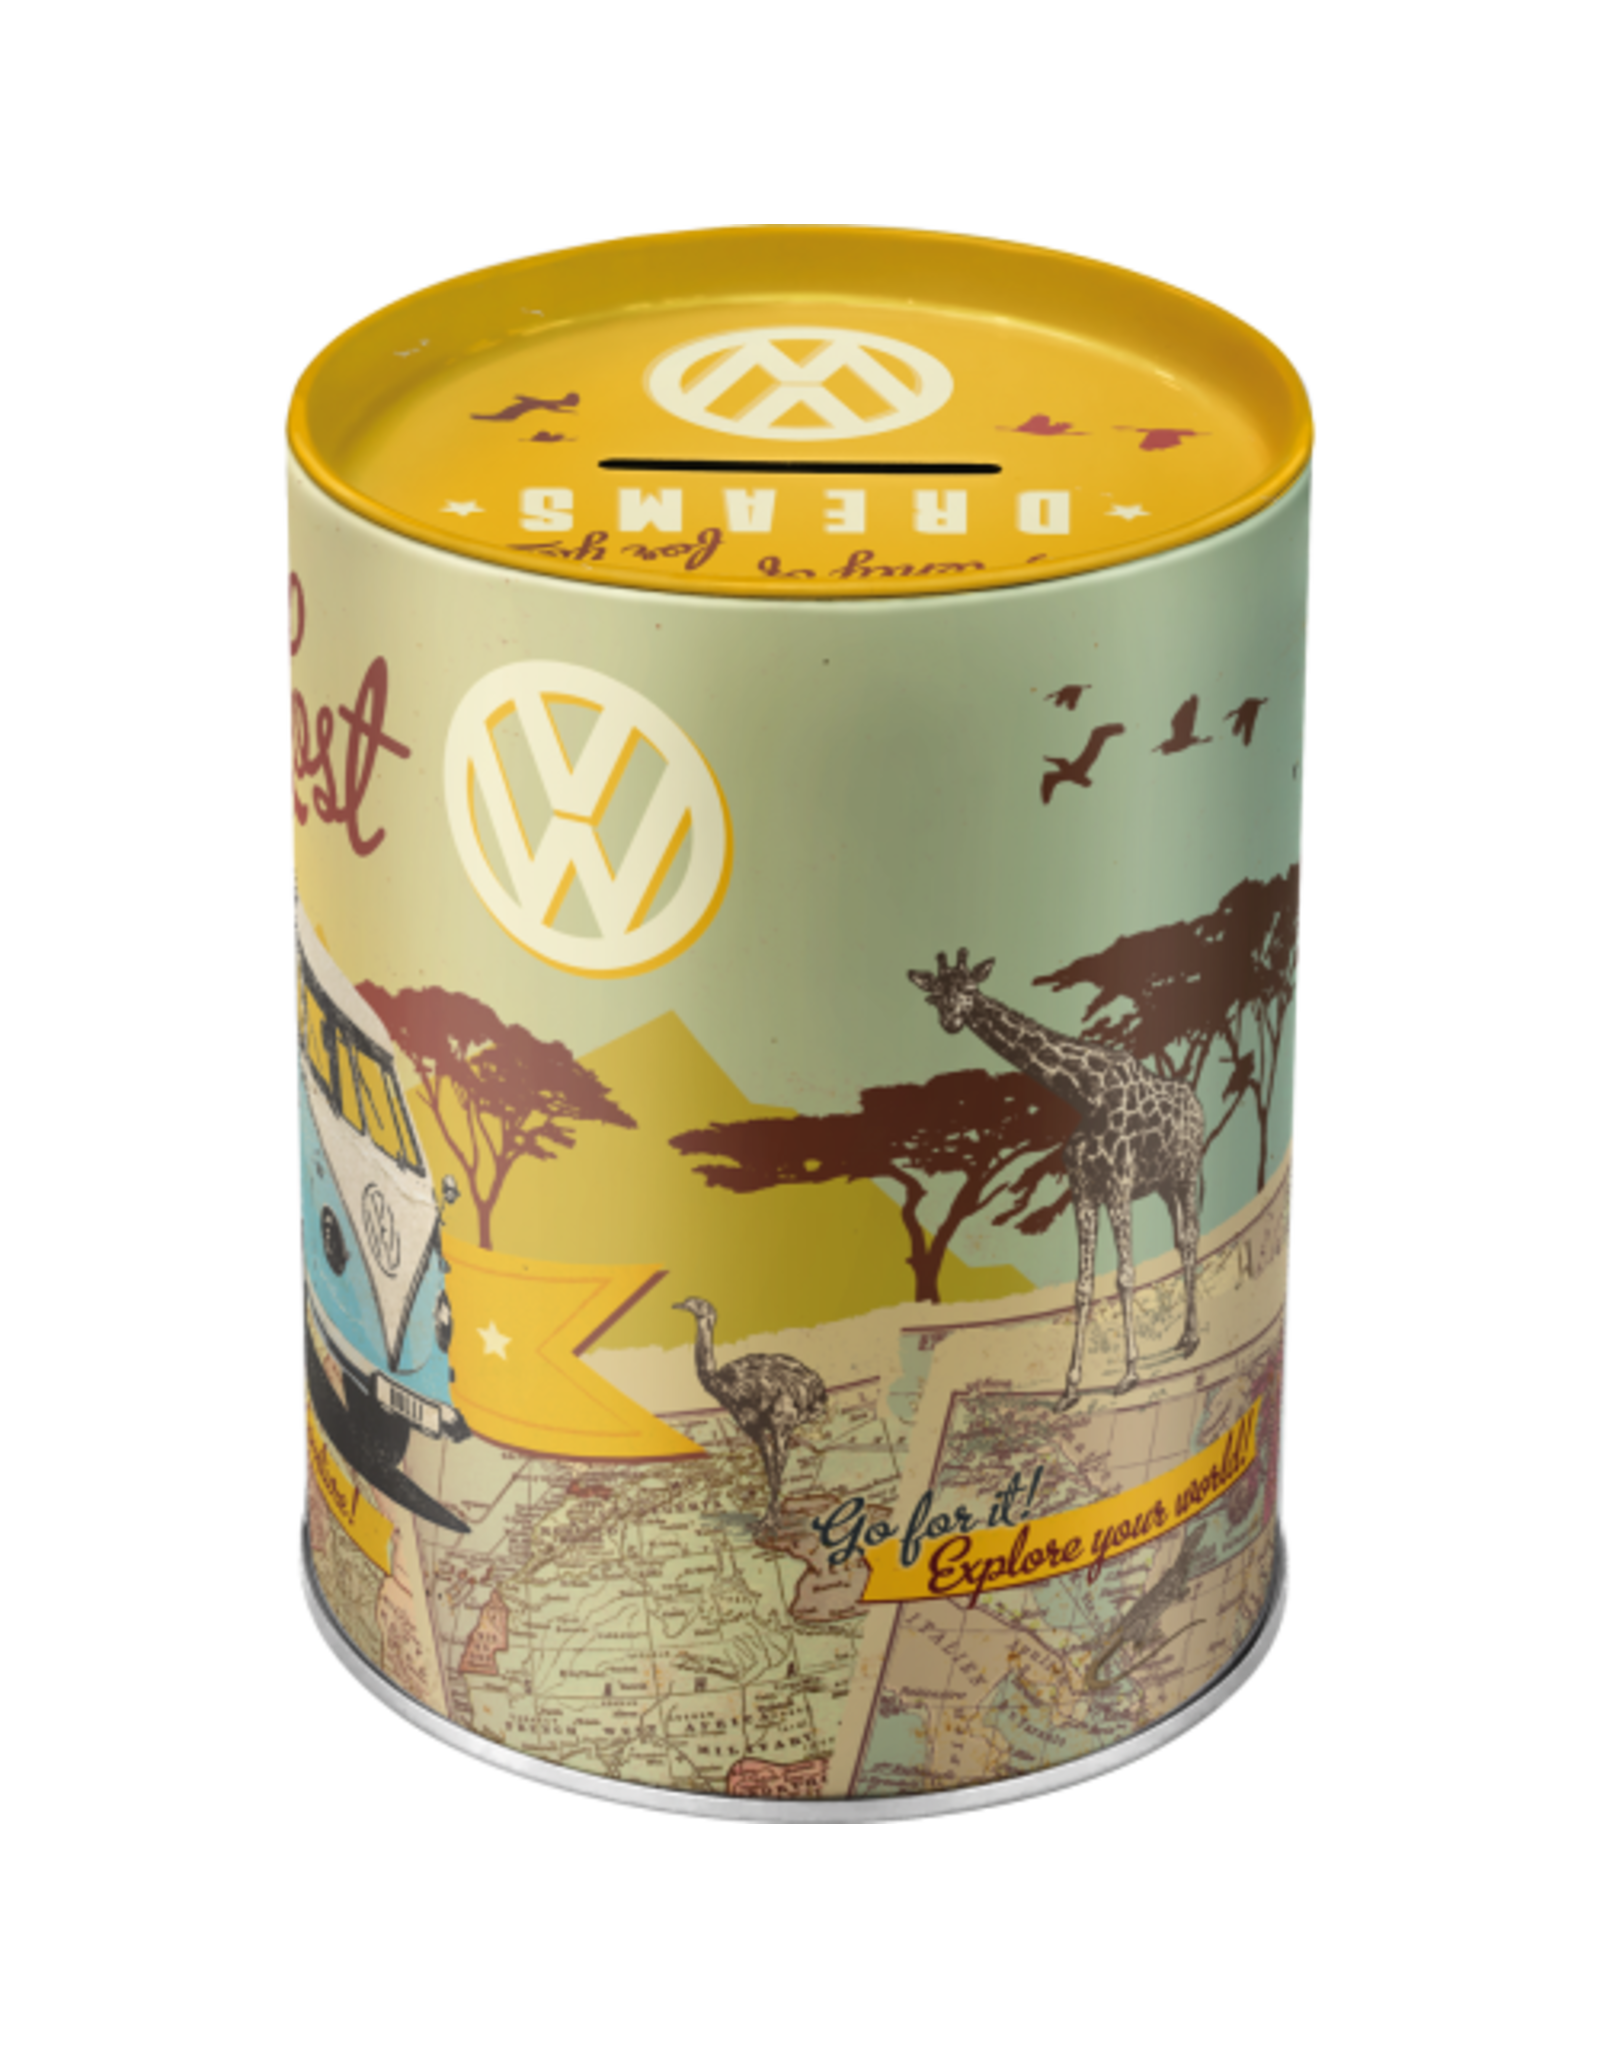 moneybox - let's get lost VW